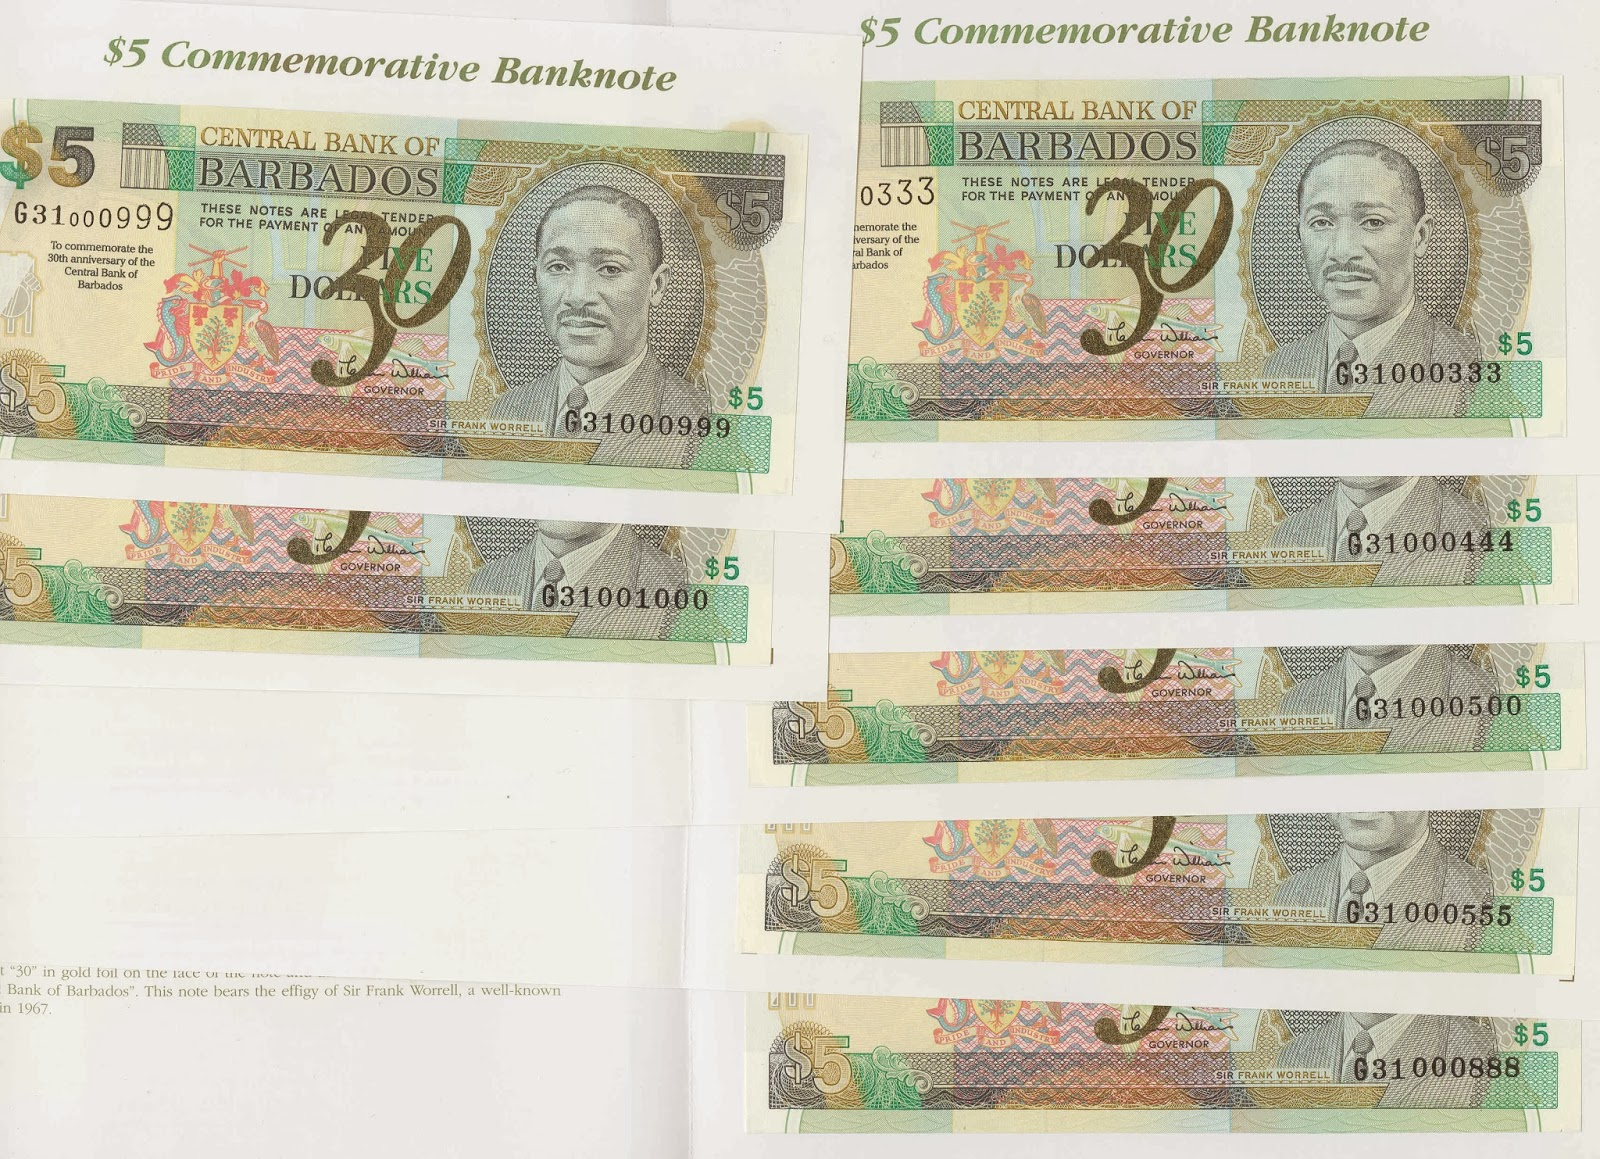 http://americabanknotes.blogspot.com/2014/01/barbados-5-2002-central-bank.html